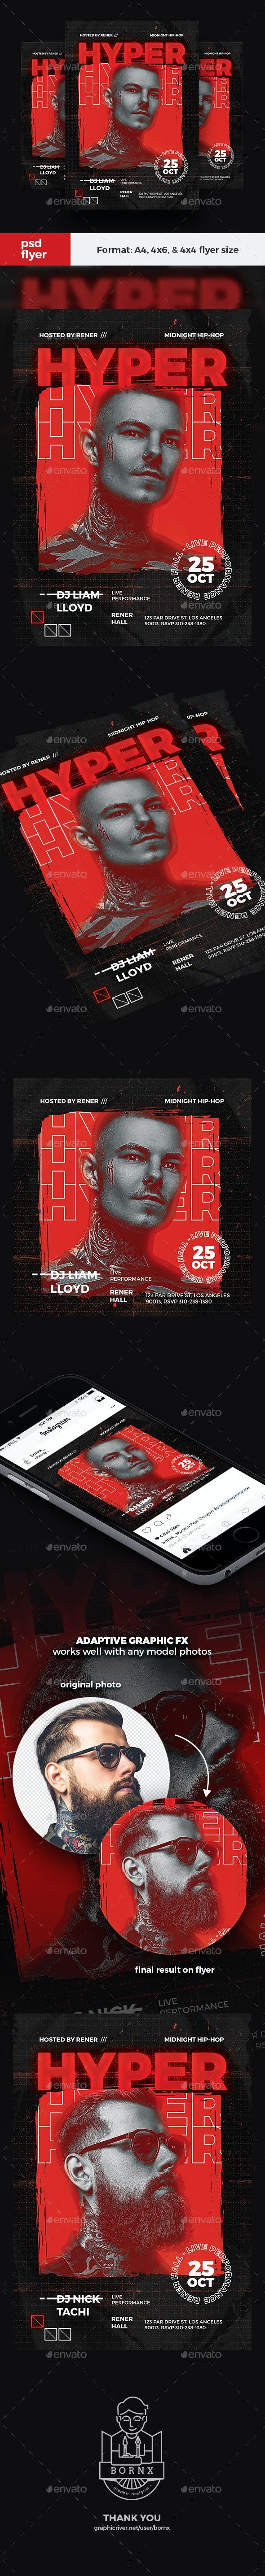 Hip Hop DJ Flyer - Clubs & Parties Events